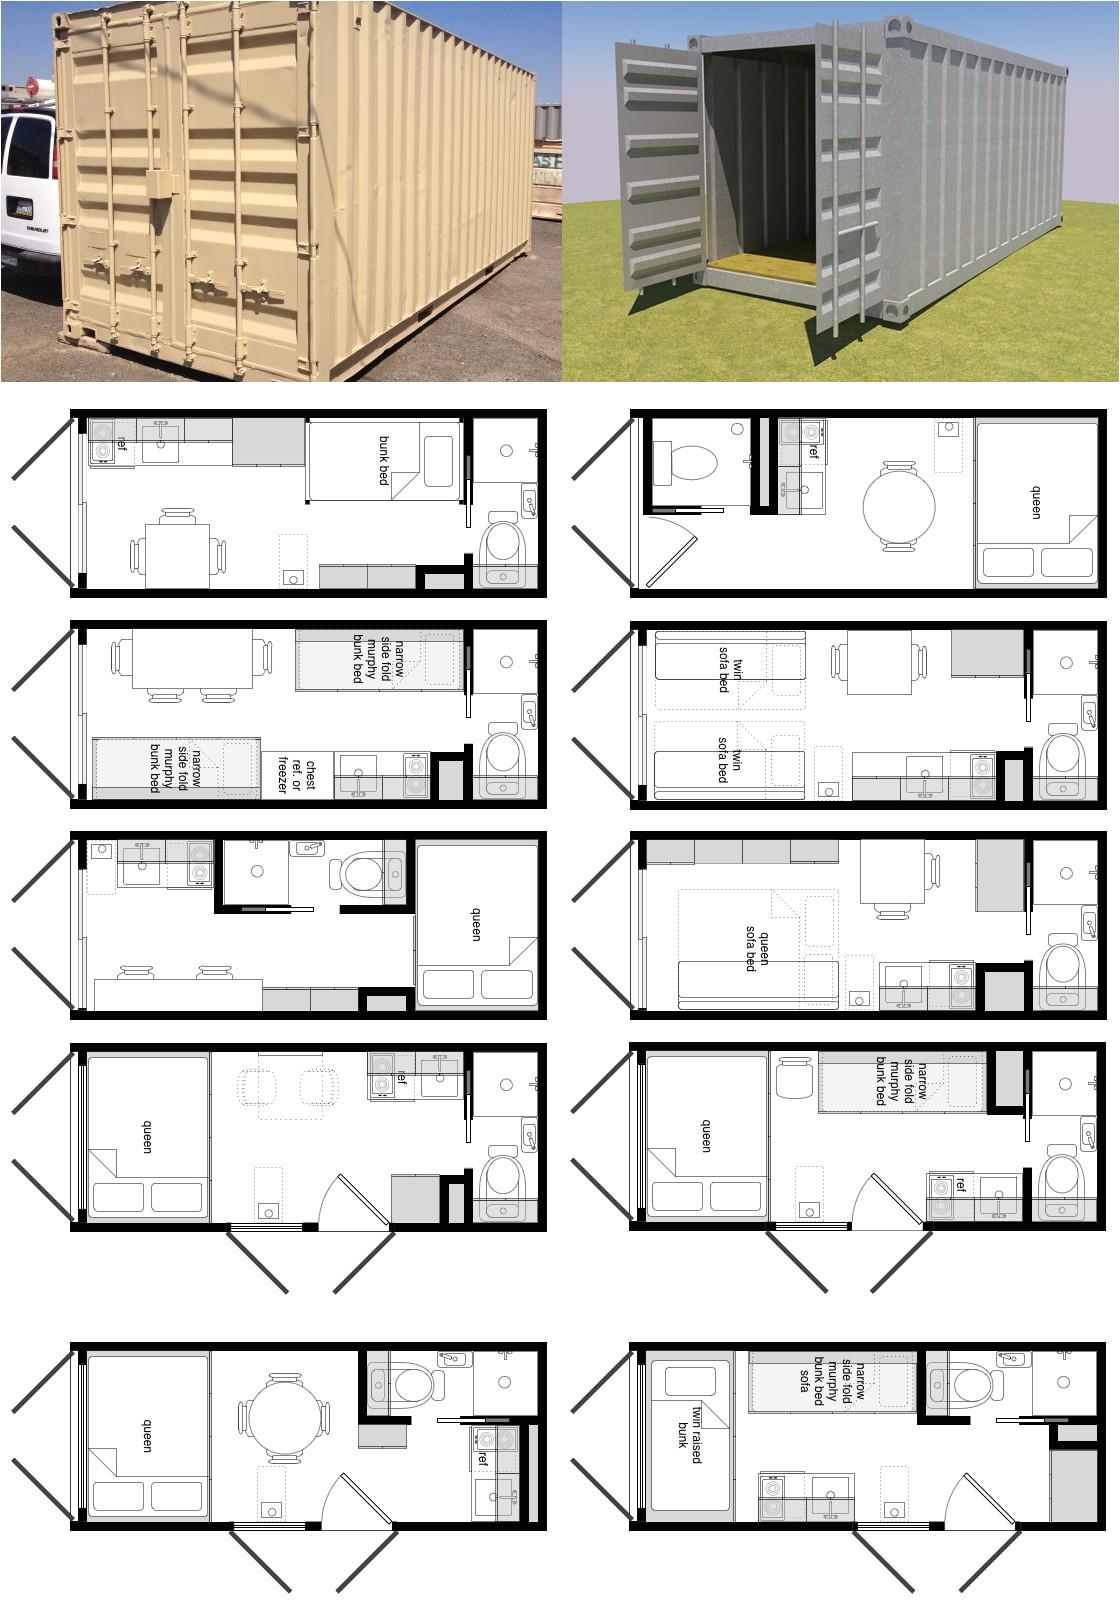 Container Home Floor Plan 20 Foot Shipping Container Floor Plan Brainstorm Ikea Decora